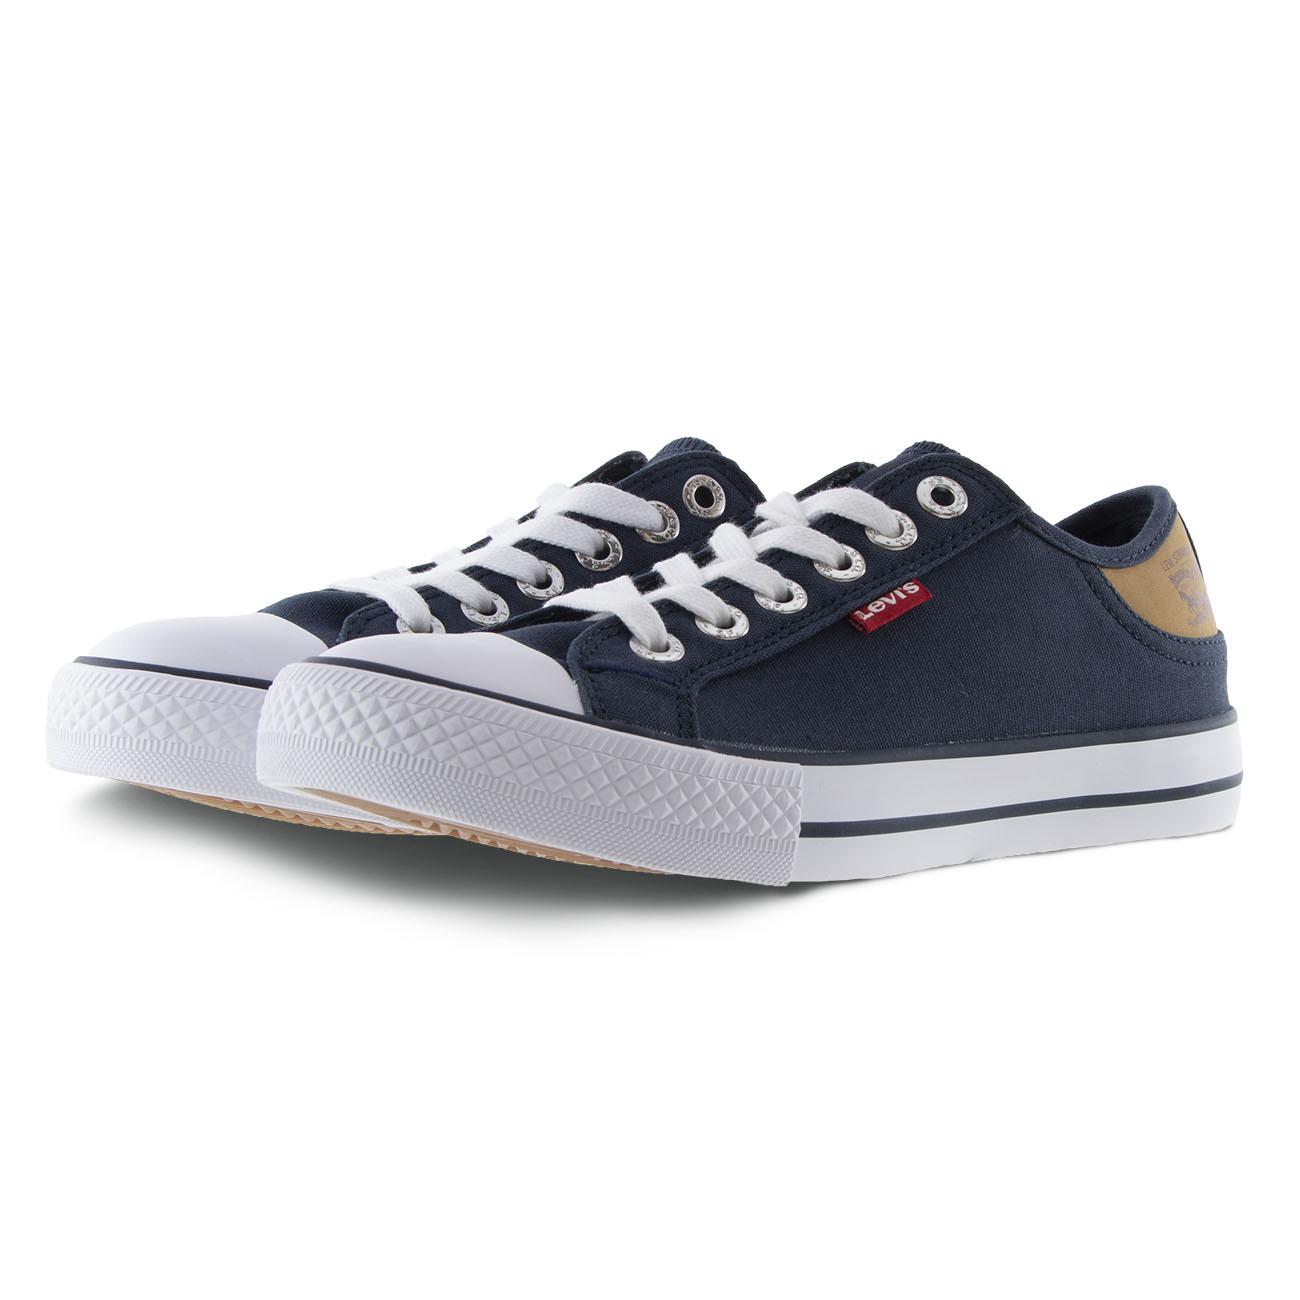 Sneaker πάνινο Levi's  222984-733